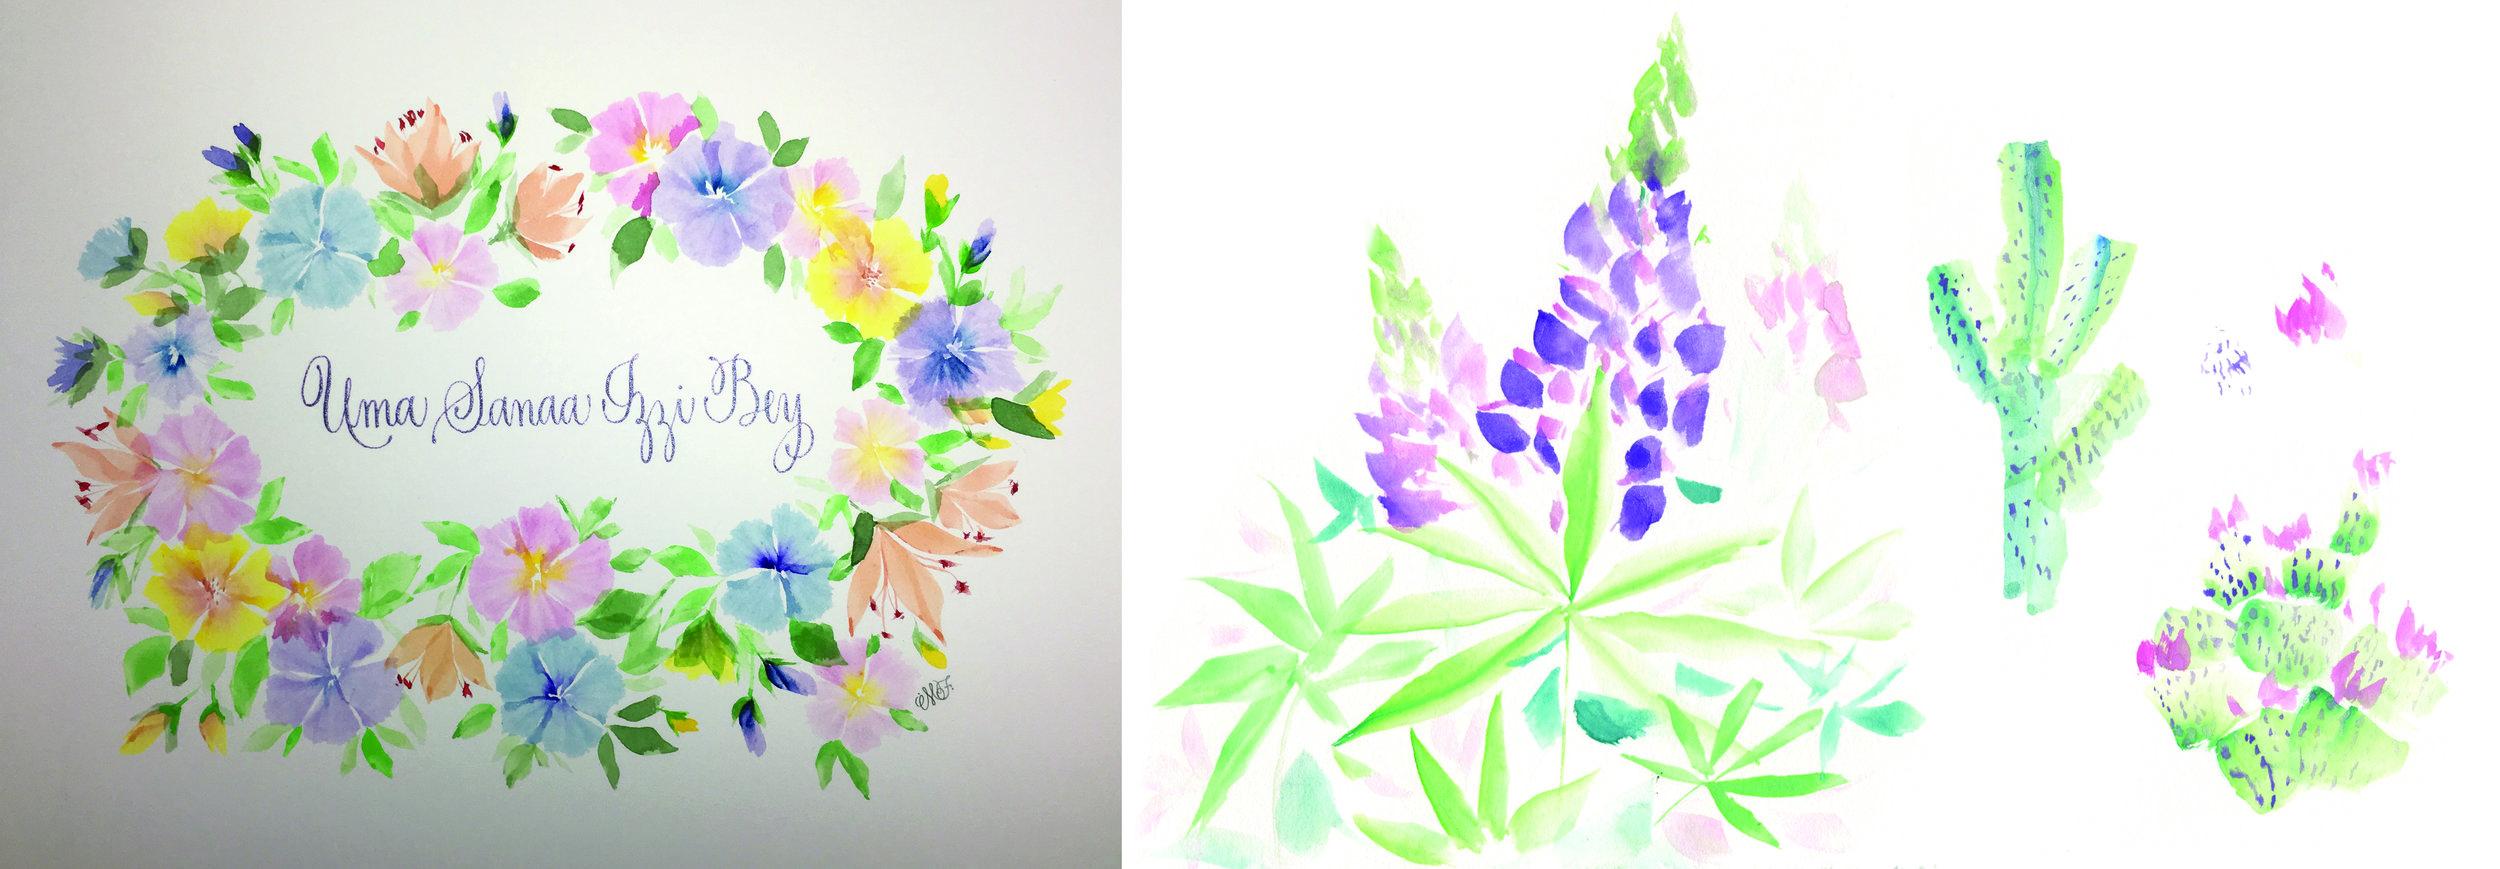 Lupine and Cactus Study